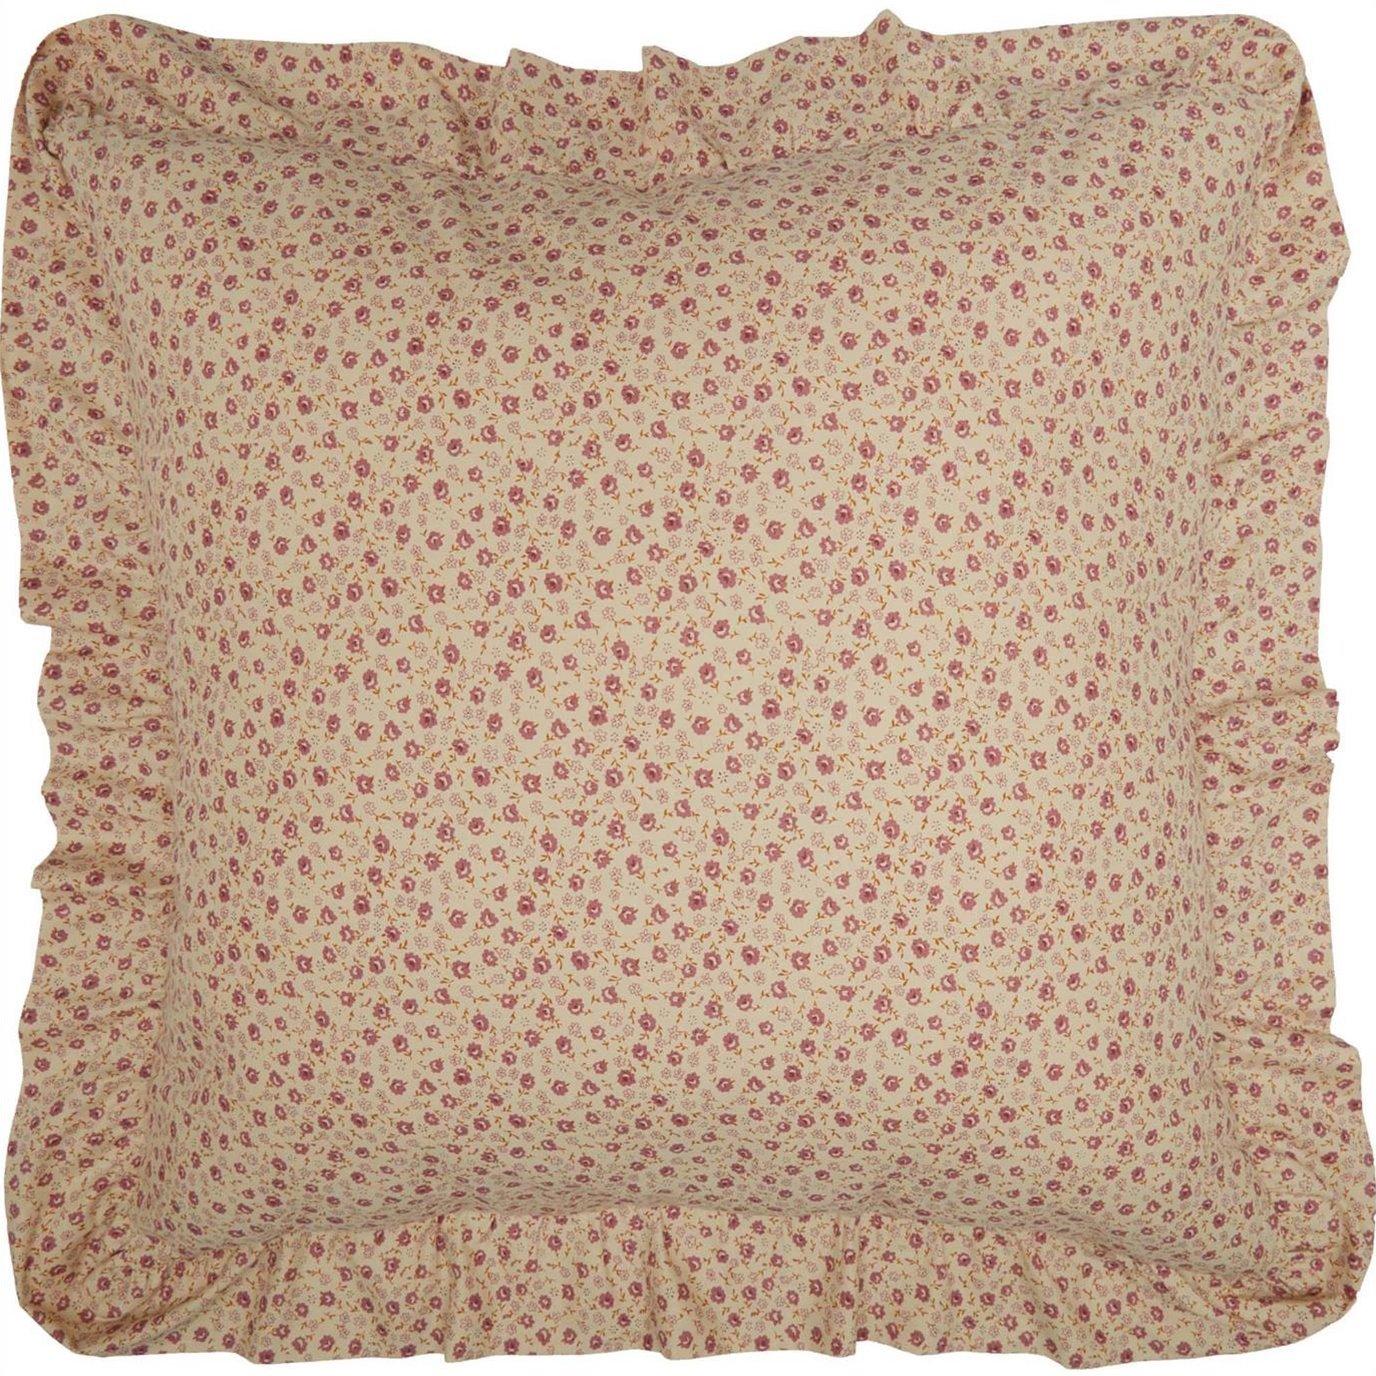 Camilia Fabric Euro Sham 26x26